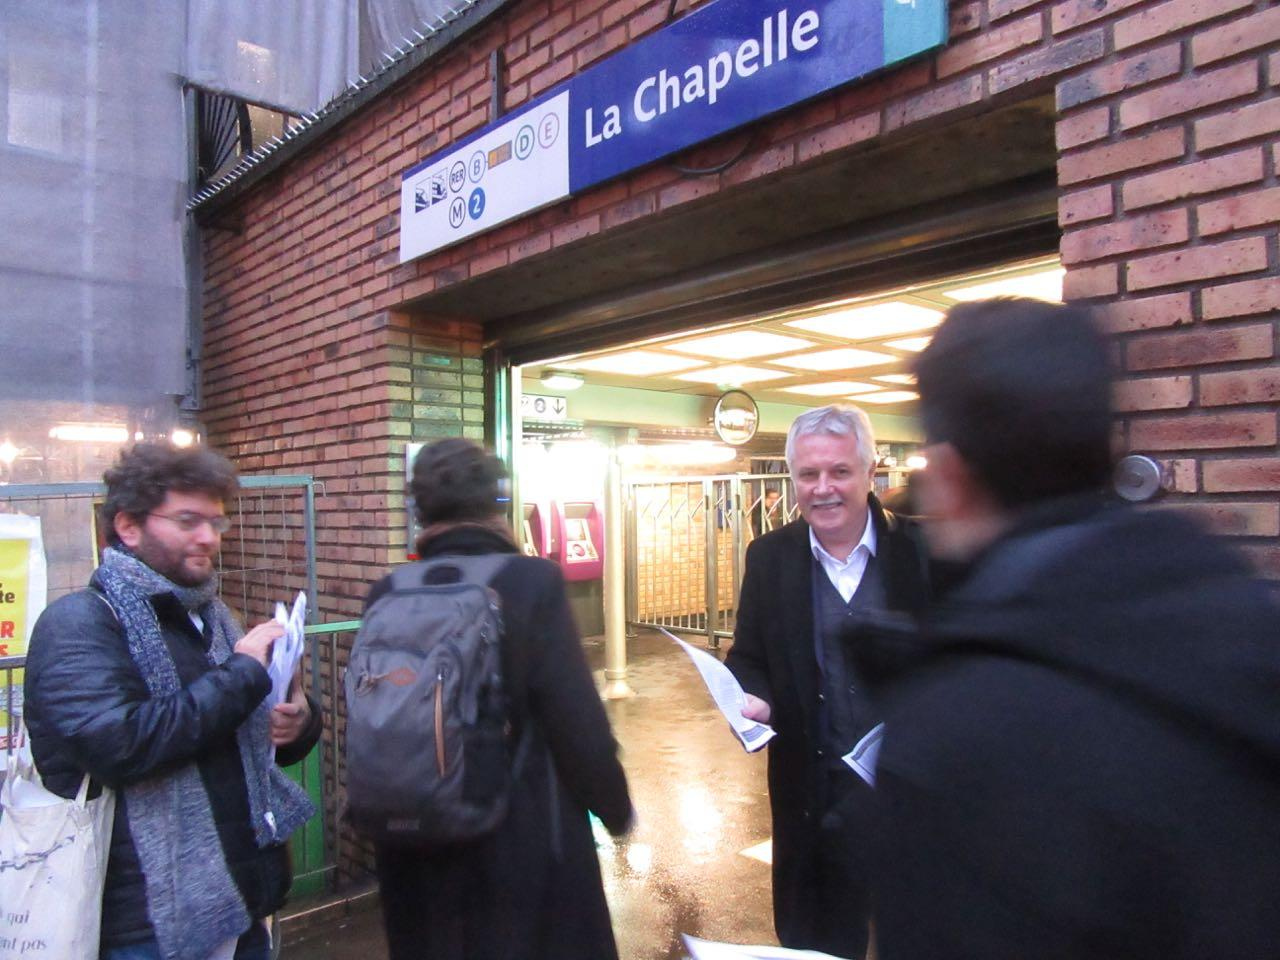 Initiative devant la station La Chapelle Nov 2018 img_8638.jpg